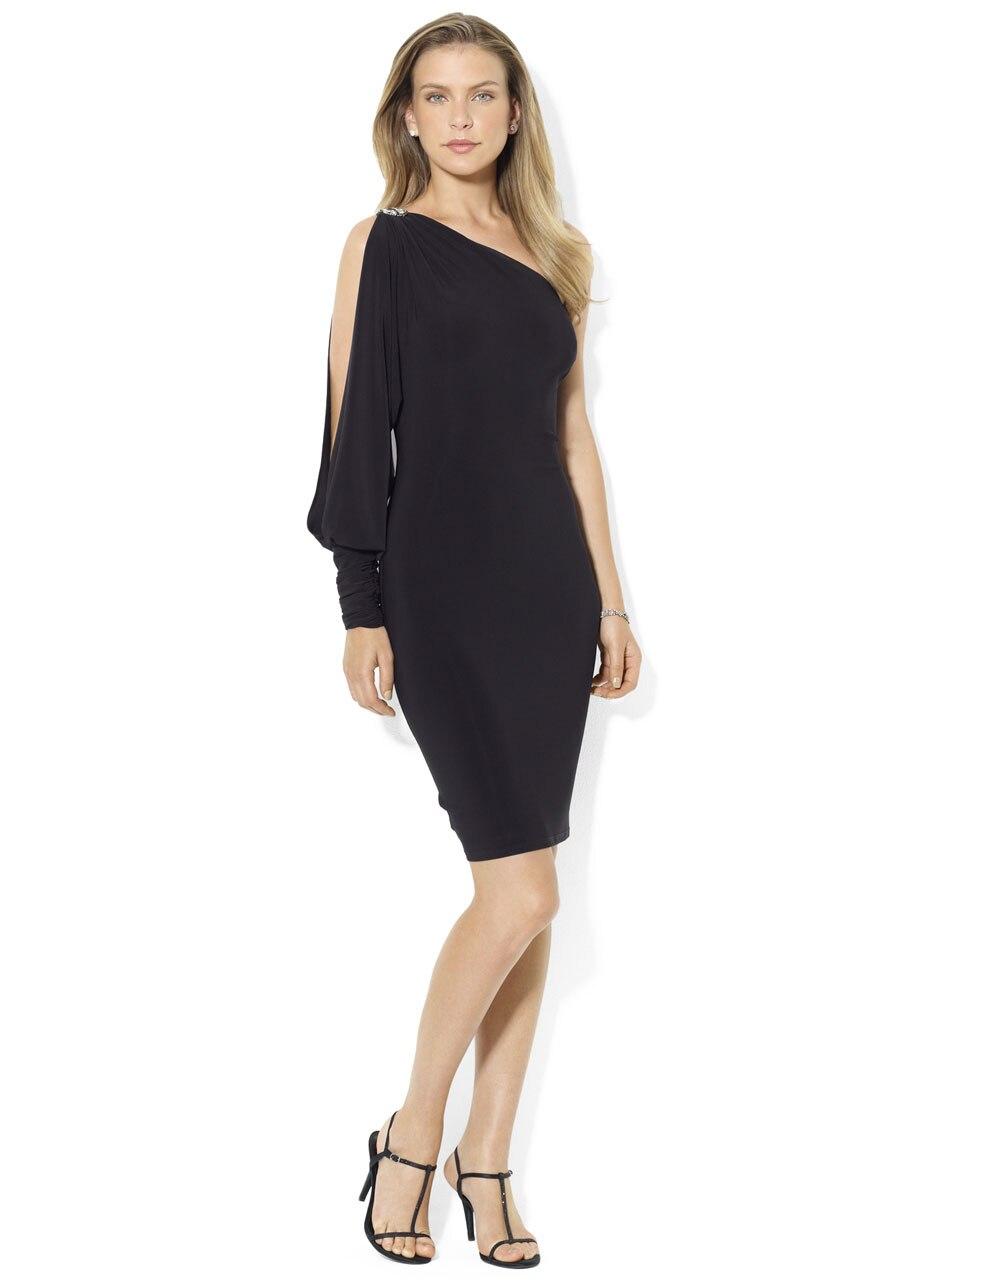 Vintage Black Chiffon One-Shoulder Plus Size Mother Of The Bride Dresses A-line Groom Godmother Evening Dresses Asymmentric